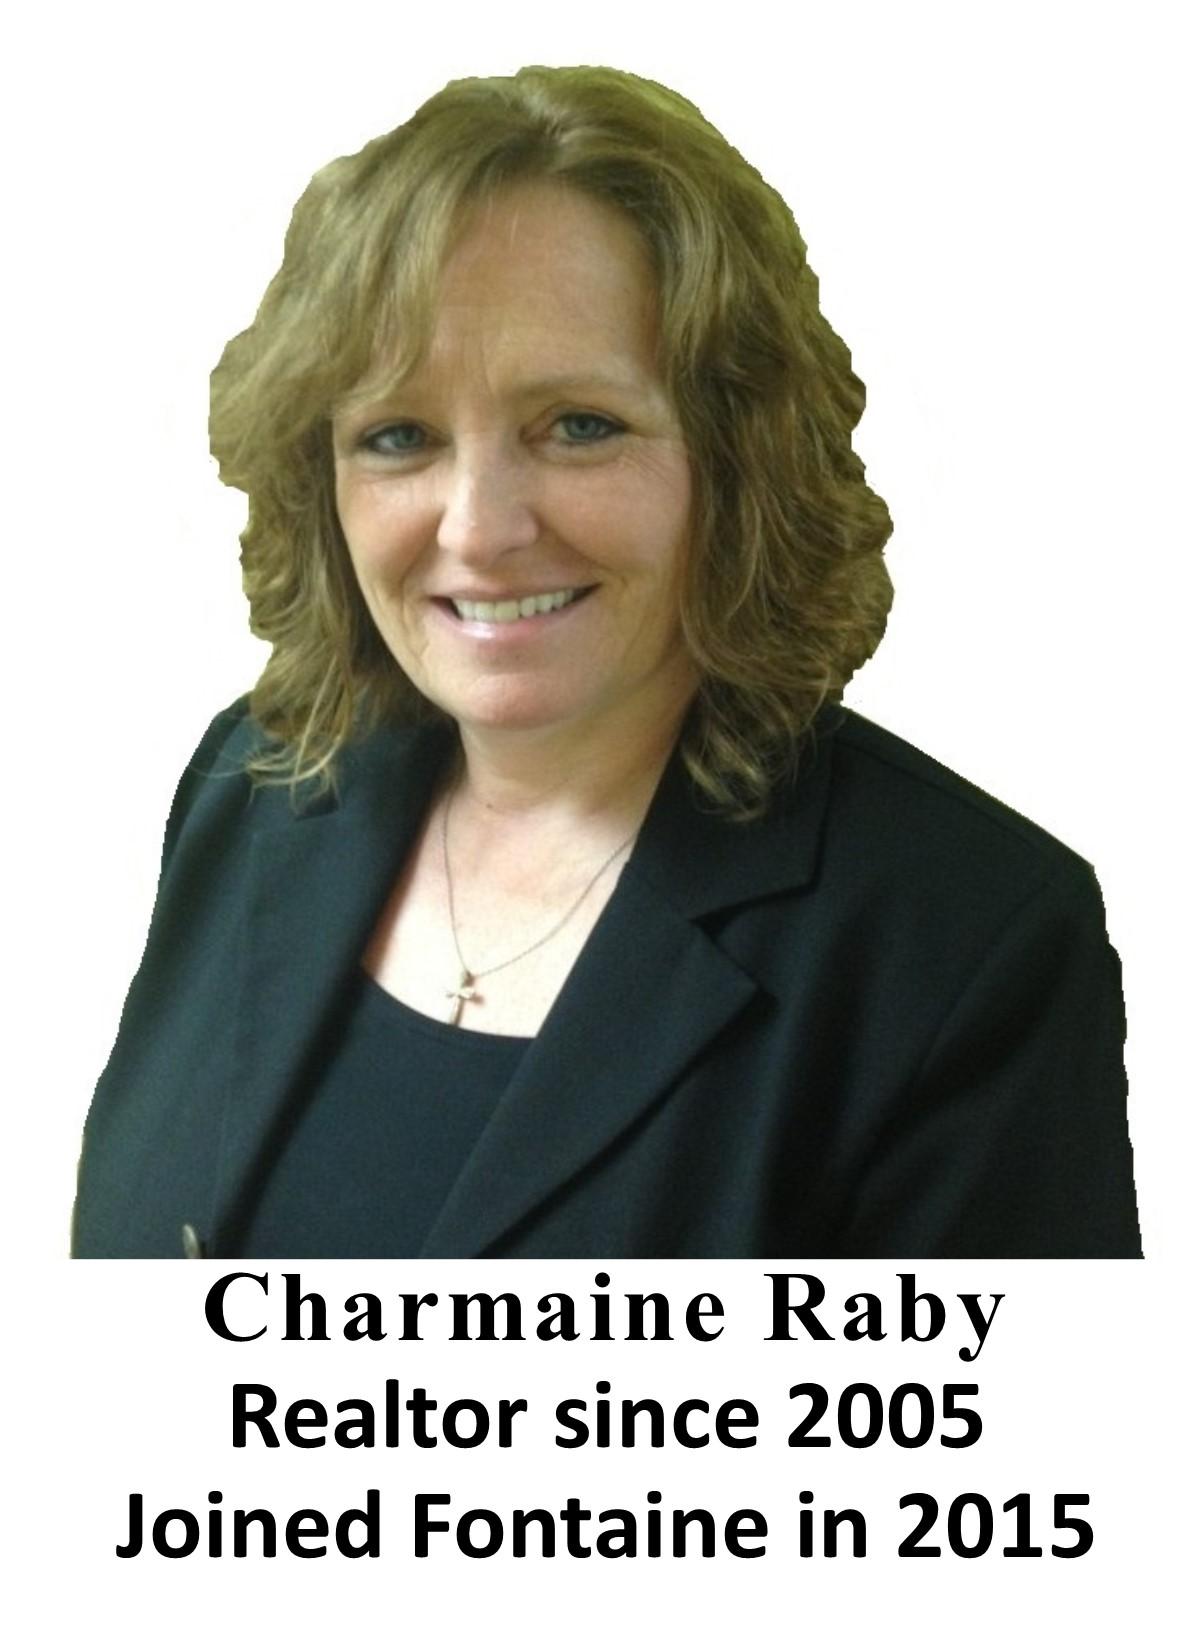 Charmaine Raby